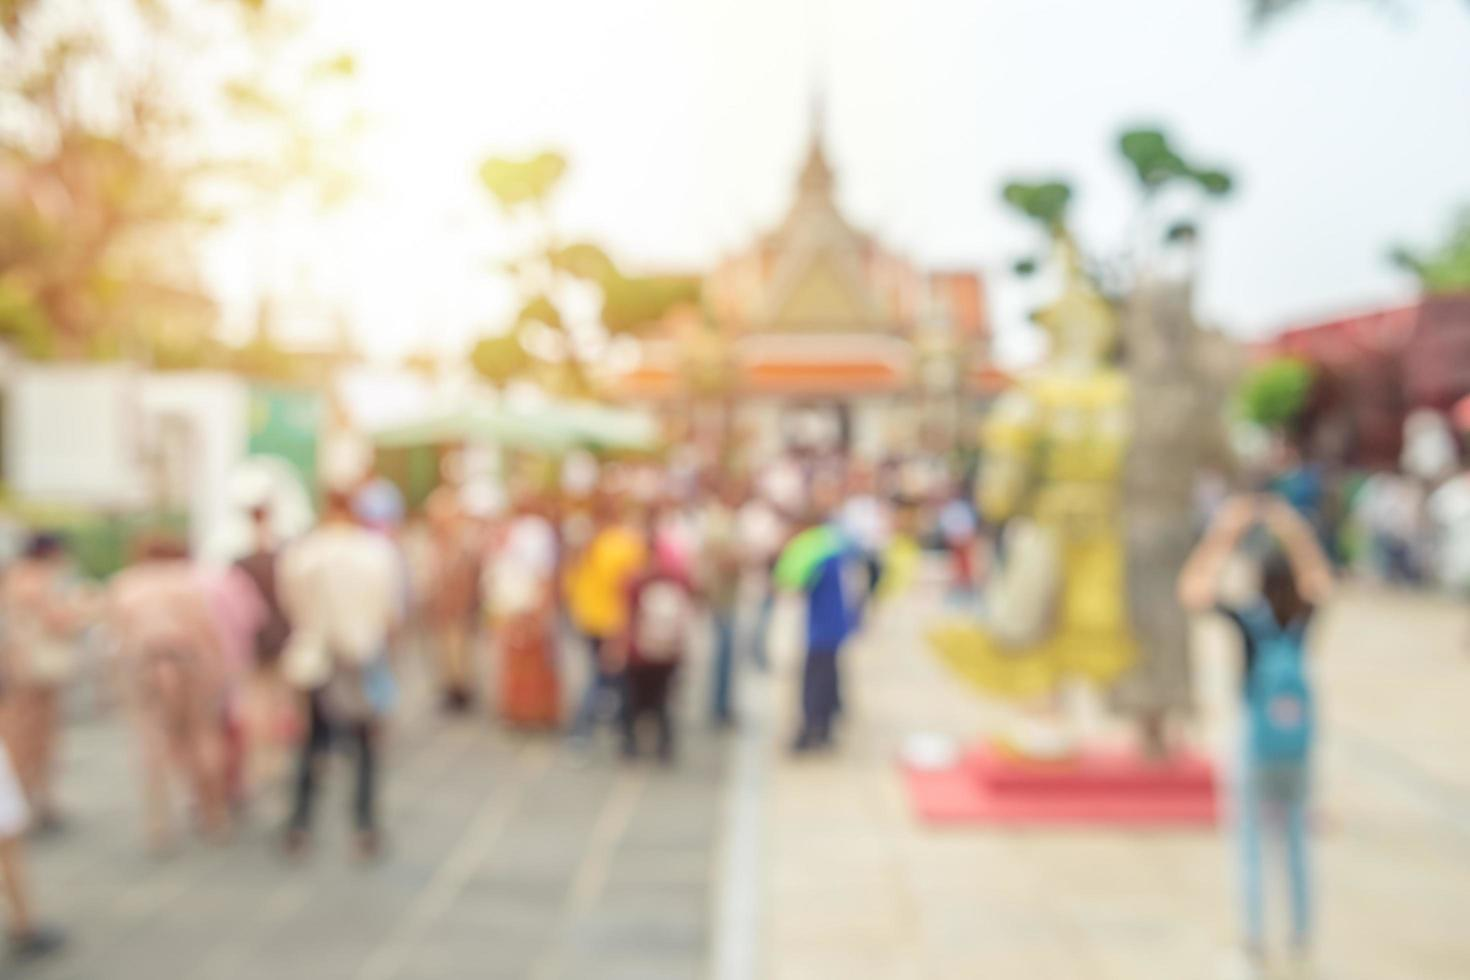 samenvatting vaag van menigte bij wat arun-tempel foto